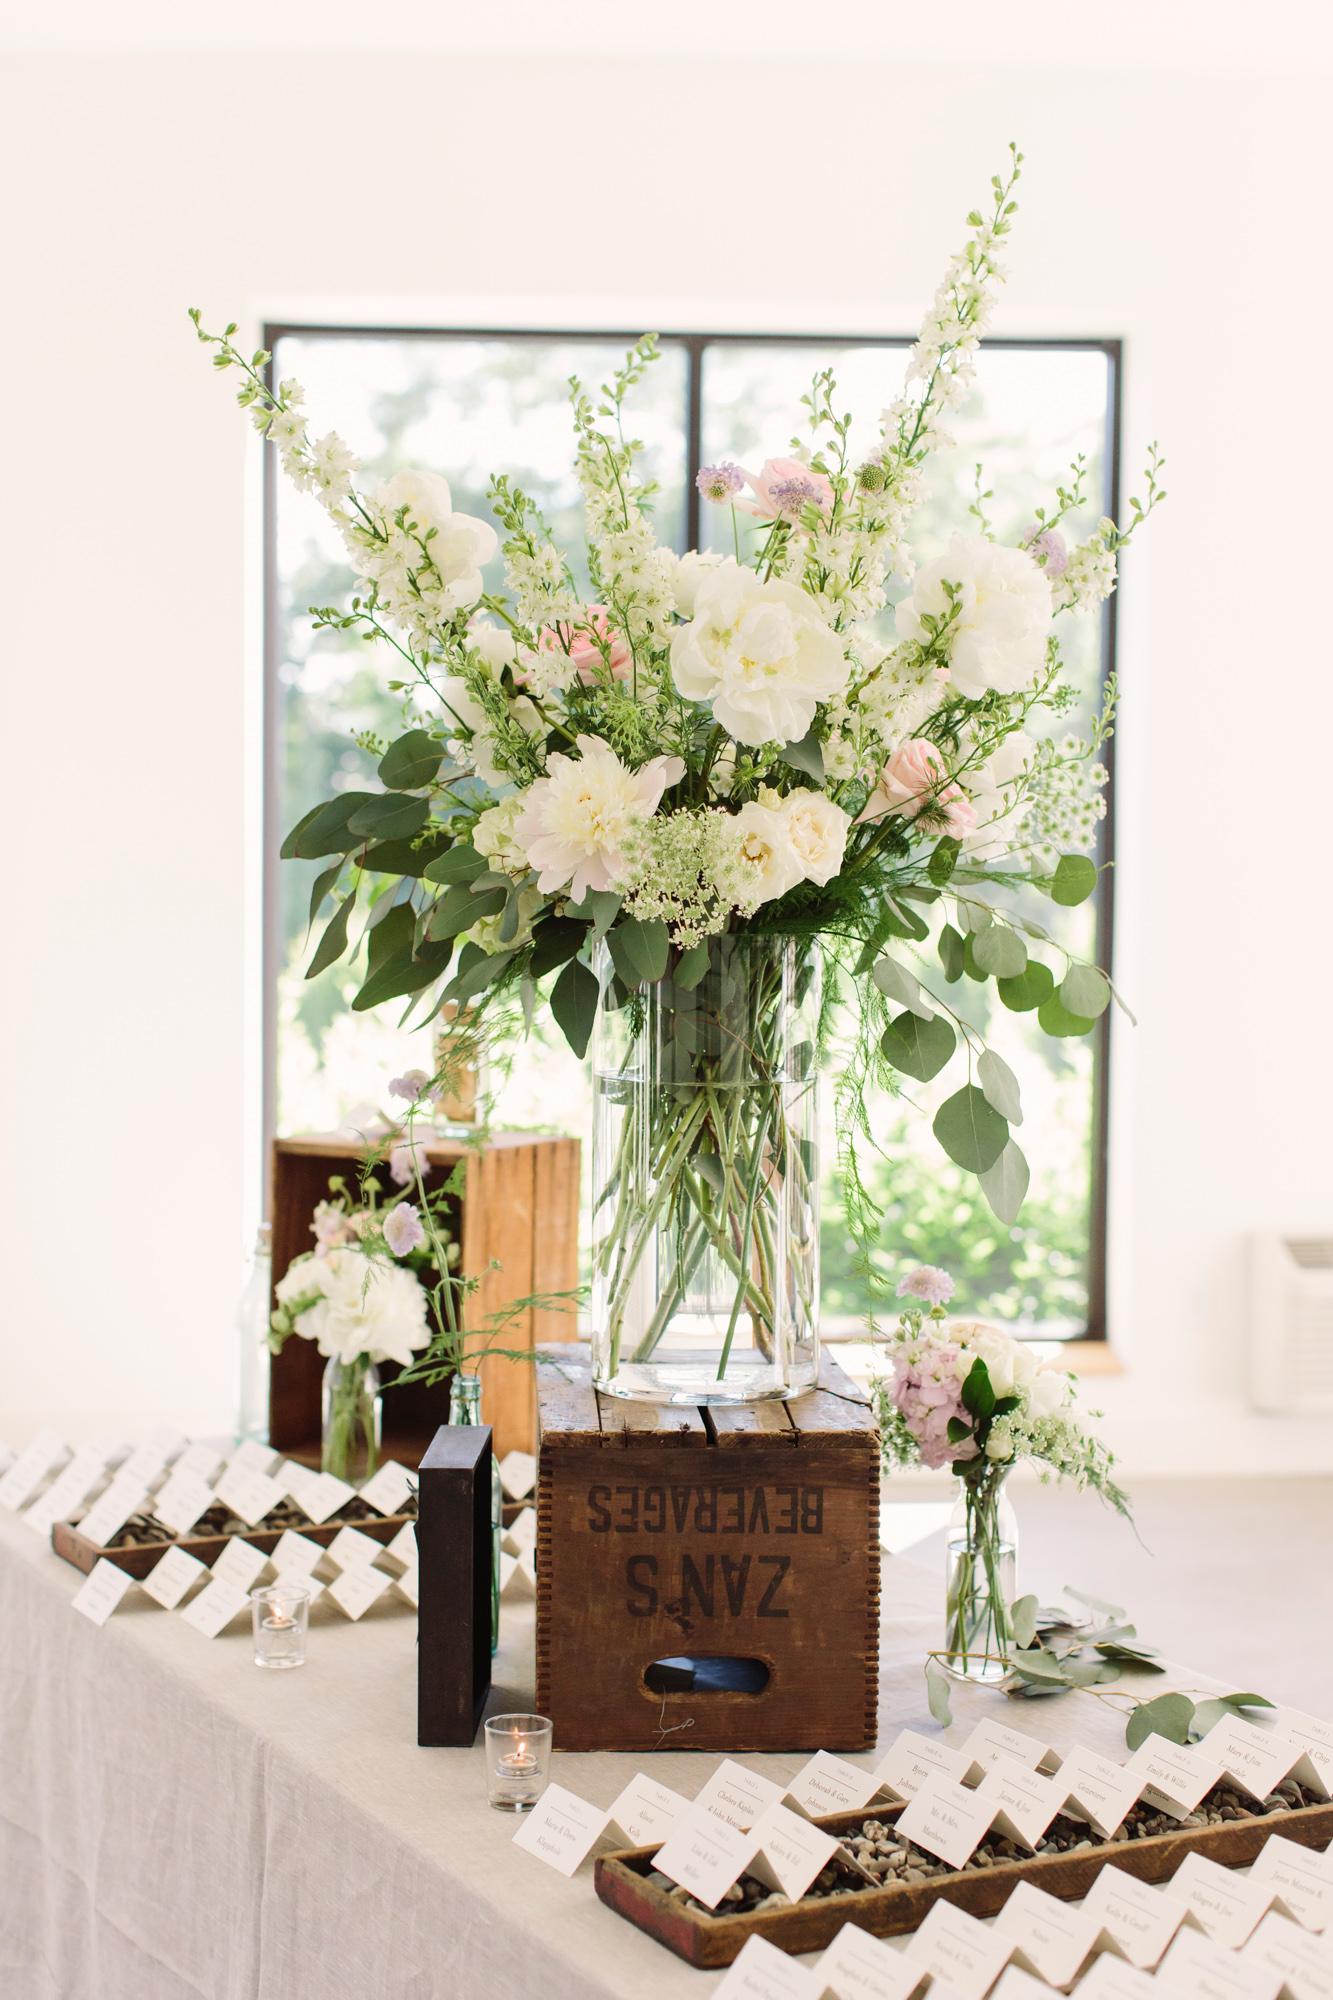 56_Rowan_Brian_The_Roundhouse_Wedding_Beacon_NY_Tanya_Salazar_Photography_1085.jpg